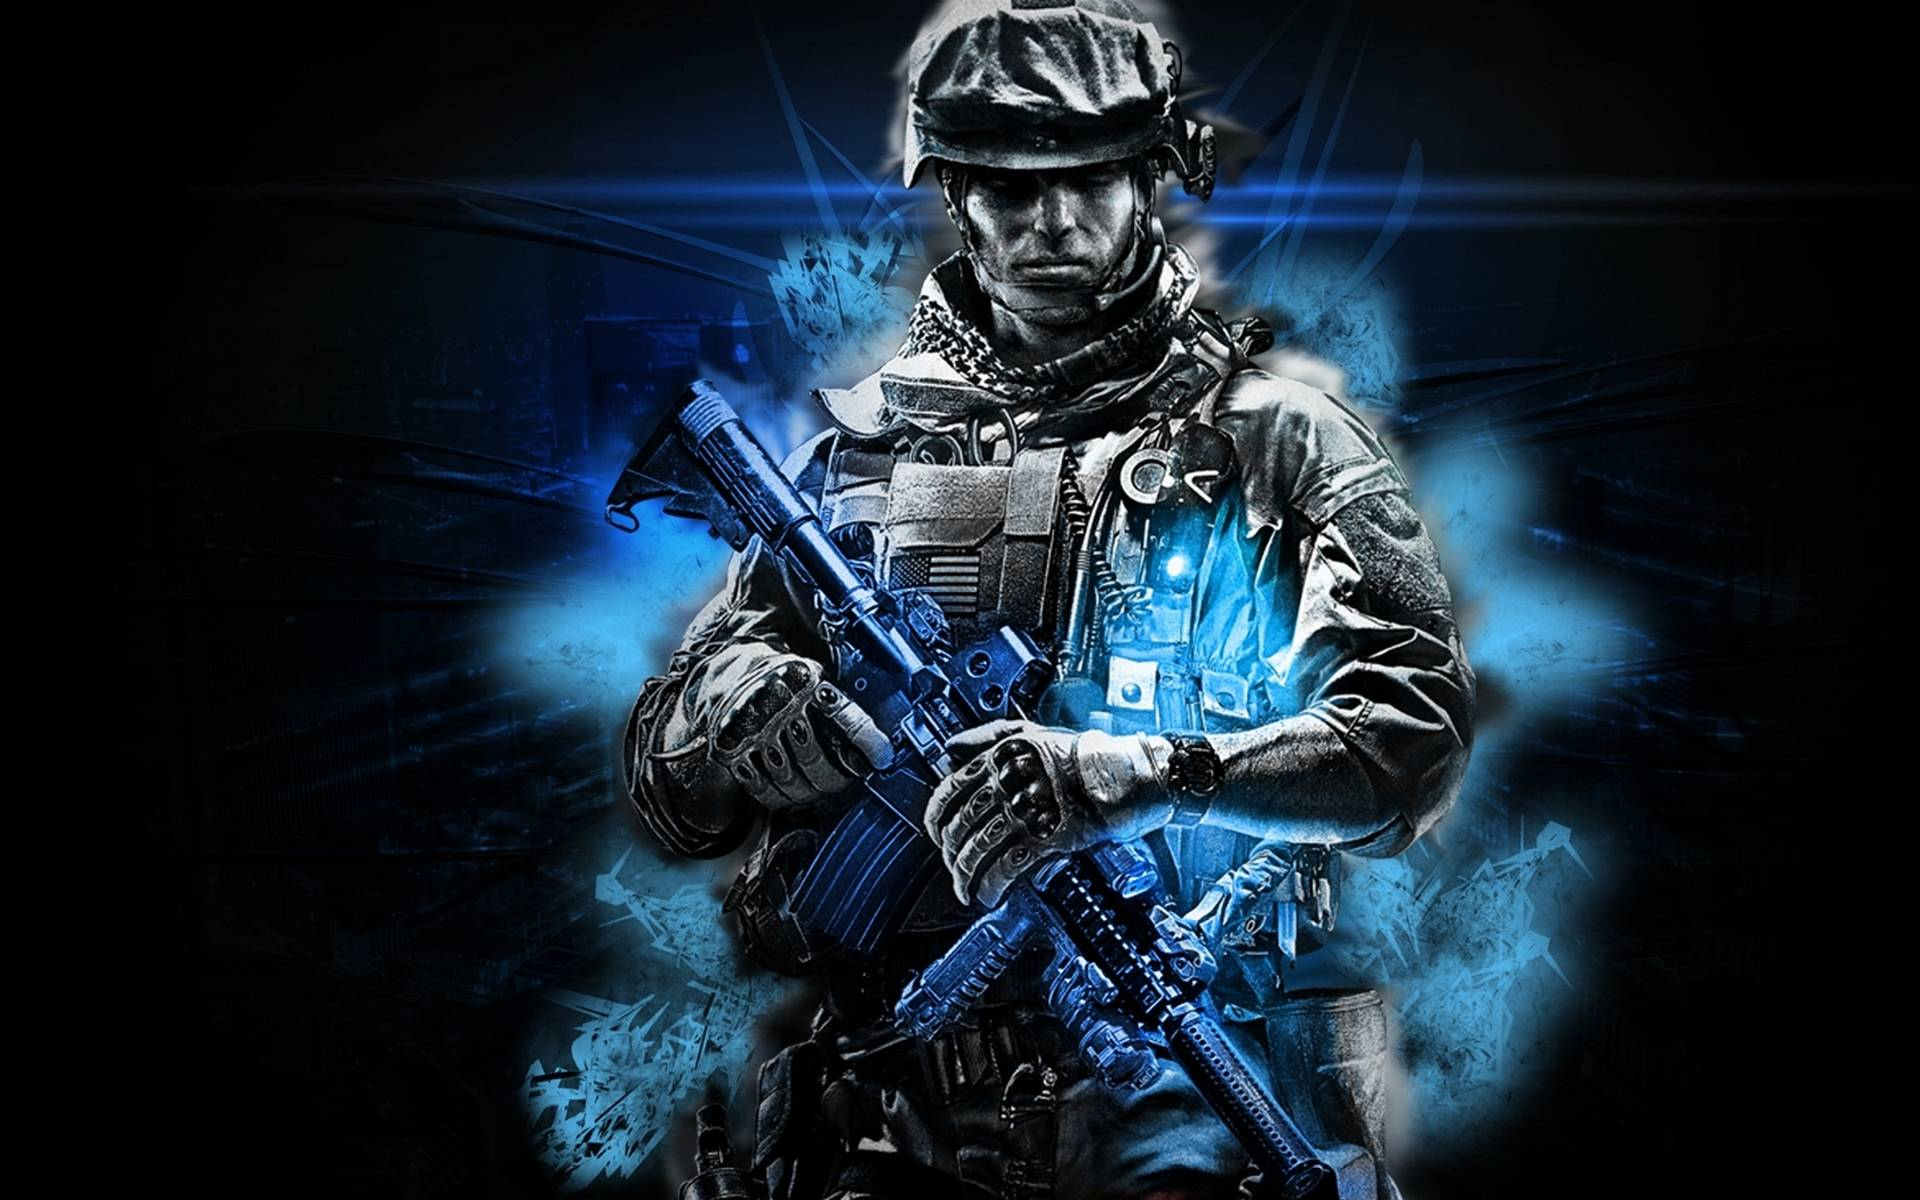 Обои солдат, экипировка, шлем, автомат